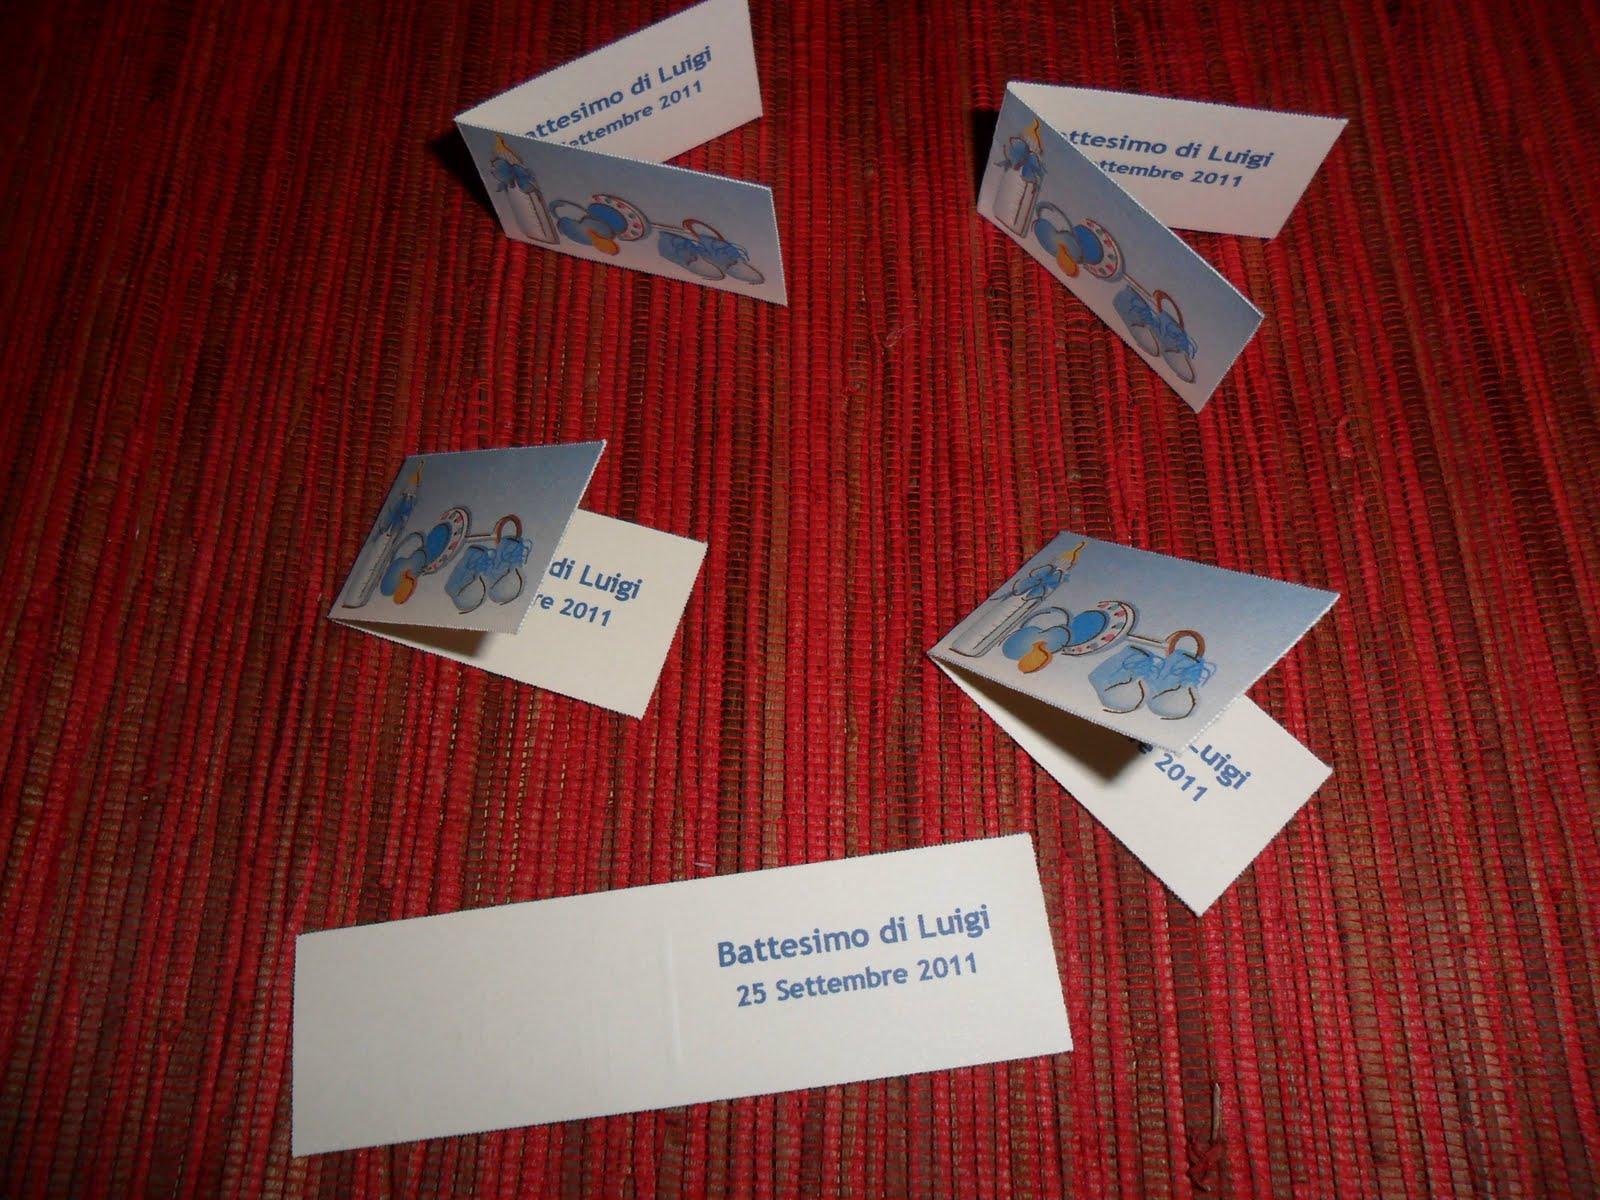 http://1.bp.blogspot.com/-skF_4NBOMNI/TmNI-8TVLvI/AAAAAAAAAIw/sVB0J5h0YnE/s1600/bigliettino+Battesimo+di+Luigi.jpg